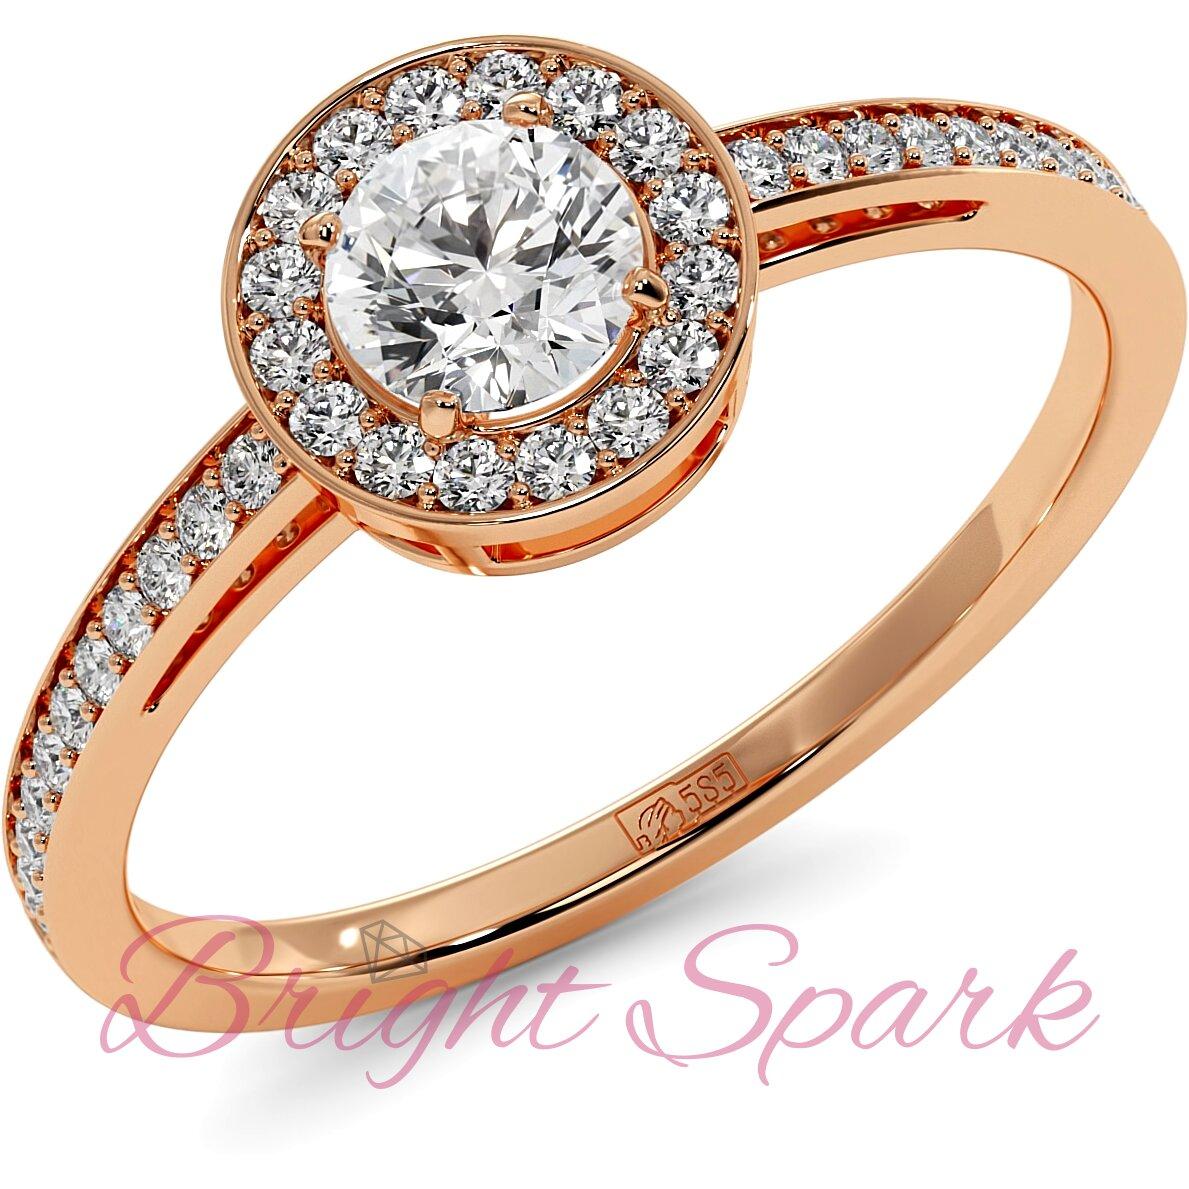 Кольцо розового золота с муассанитом в глухой оправе 0,4 карата Jessie